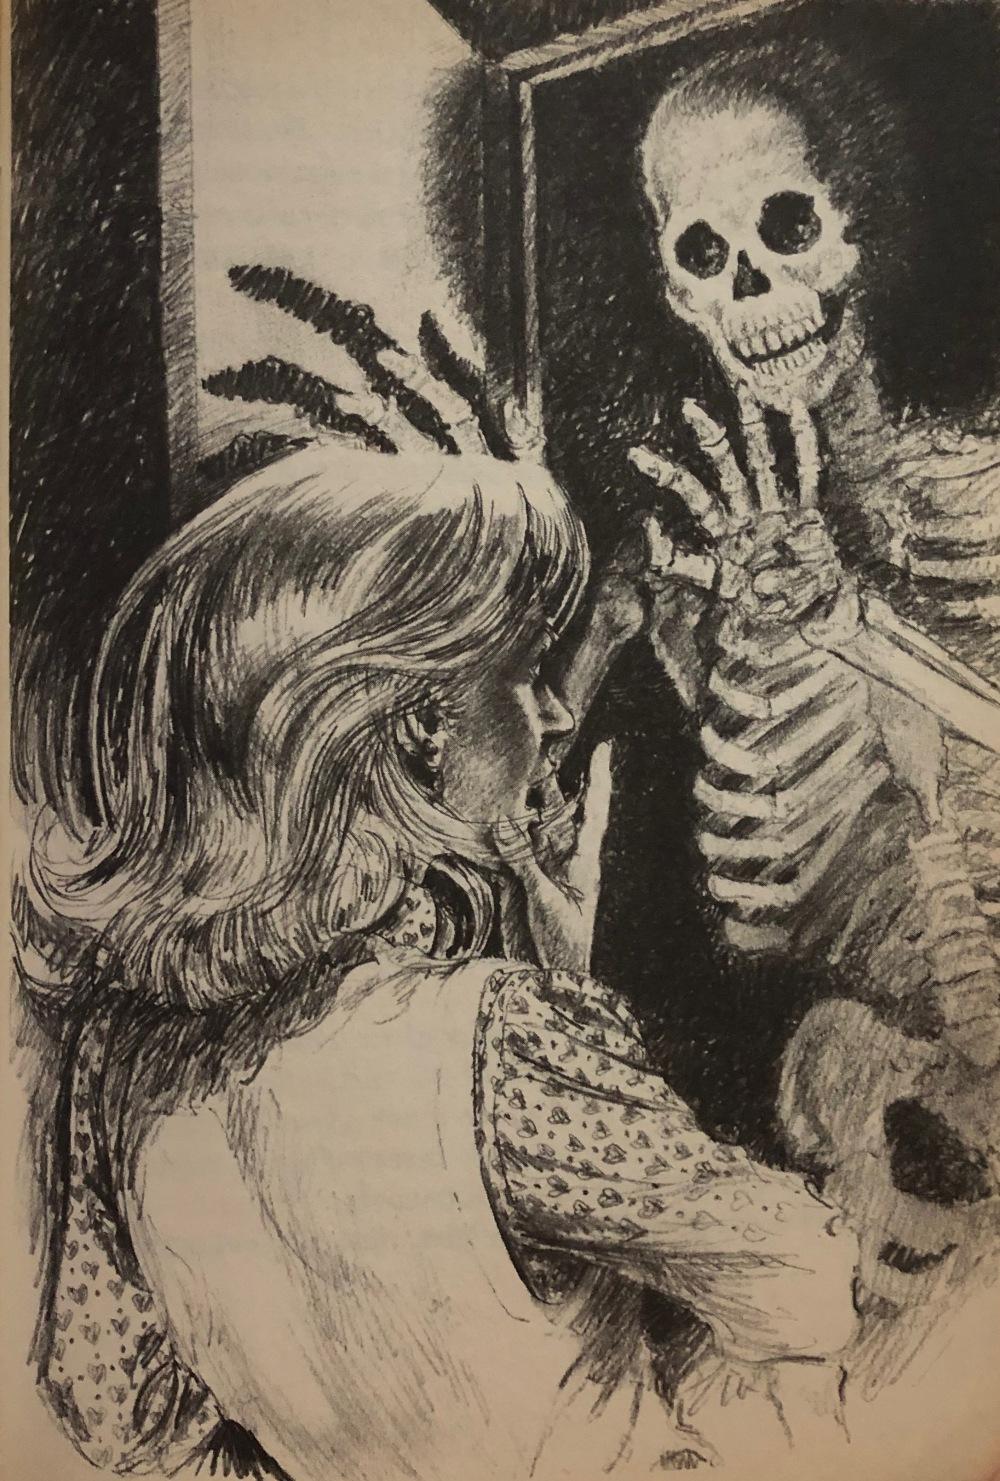 The haunted Carousell - illustration